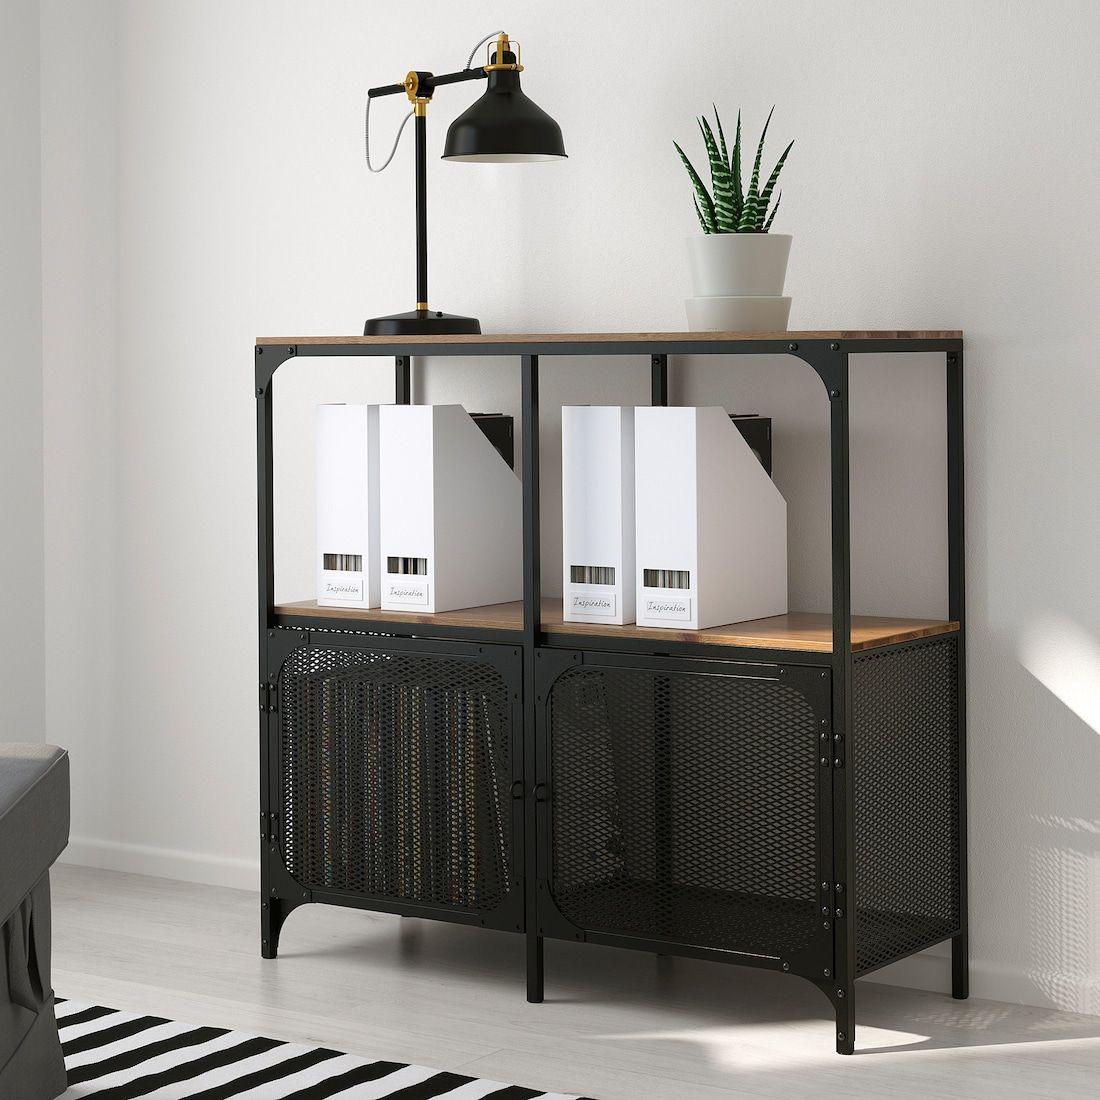 Fjallbo Shelf Unit Black 39 3 8x37 3 8 Ikea In 2020 Shelves Ikea Record Storage Shelf Unit